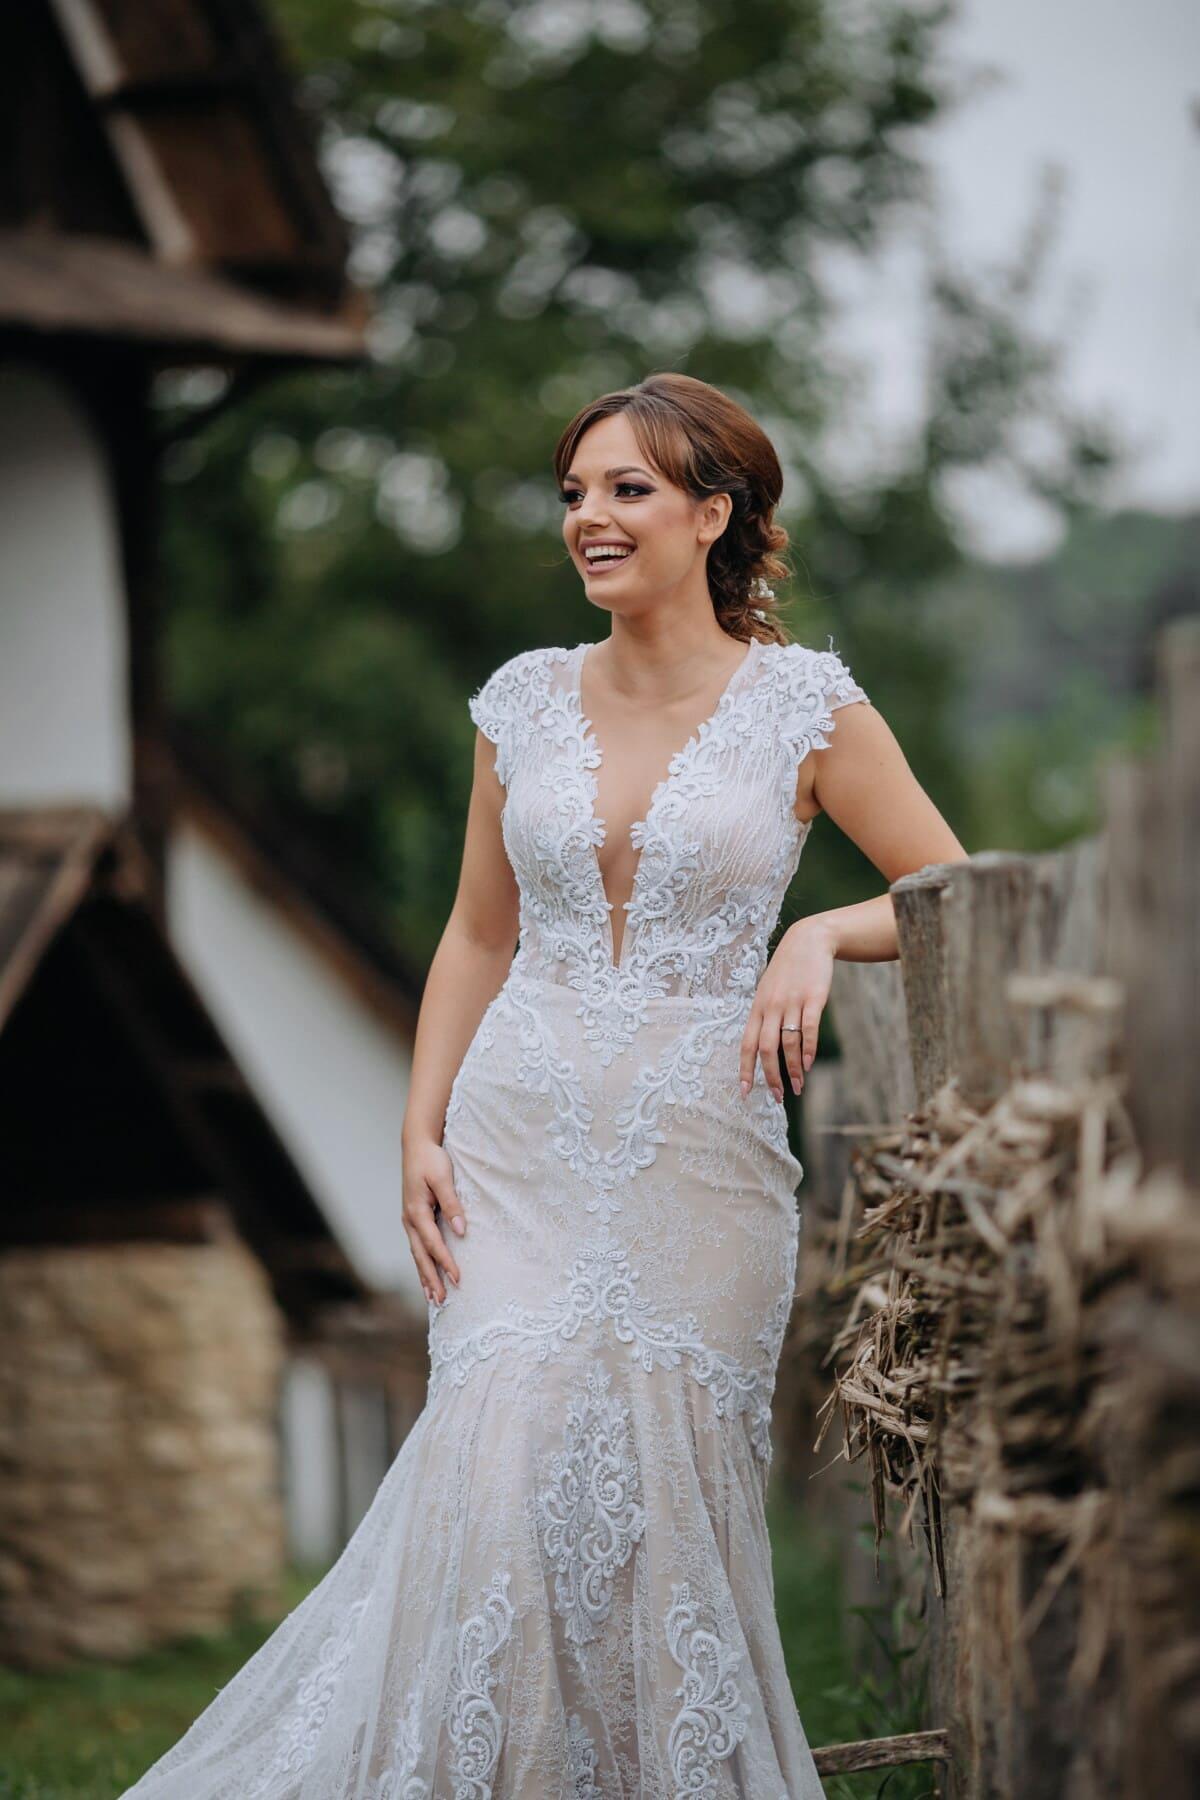 countryside, cottage, village, wedding dress, picket fence, model, fashion, wedding, dress, portrait